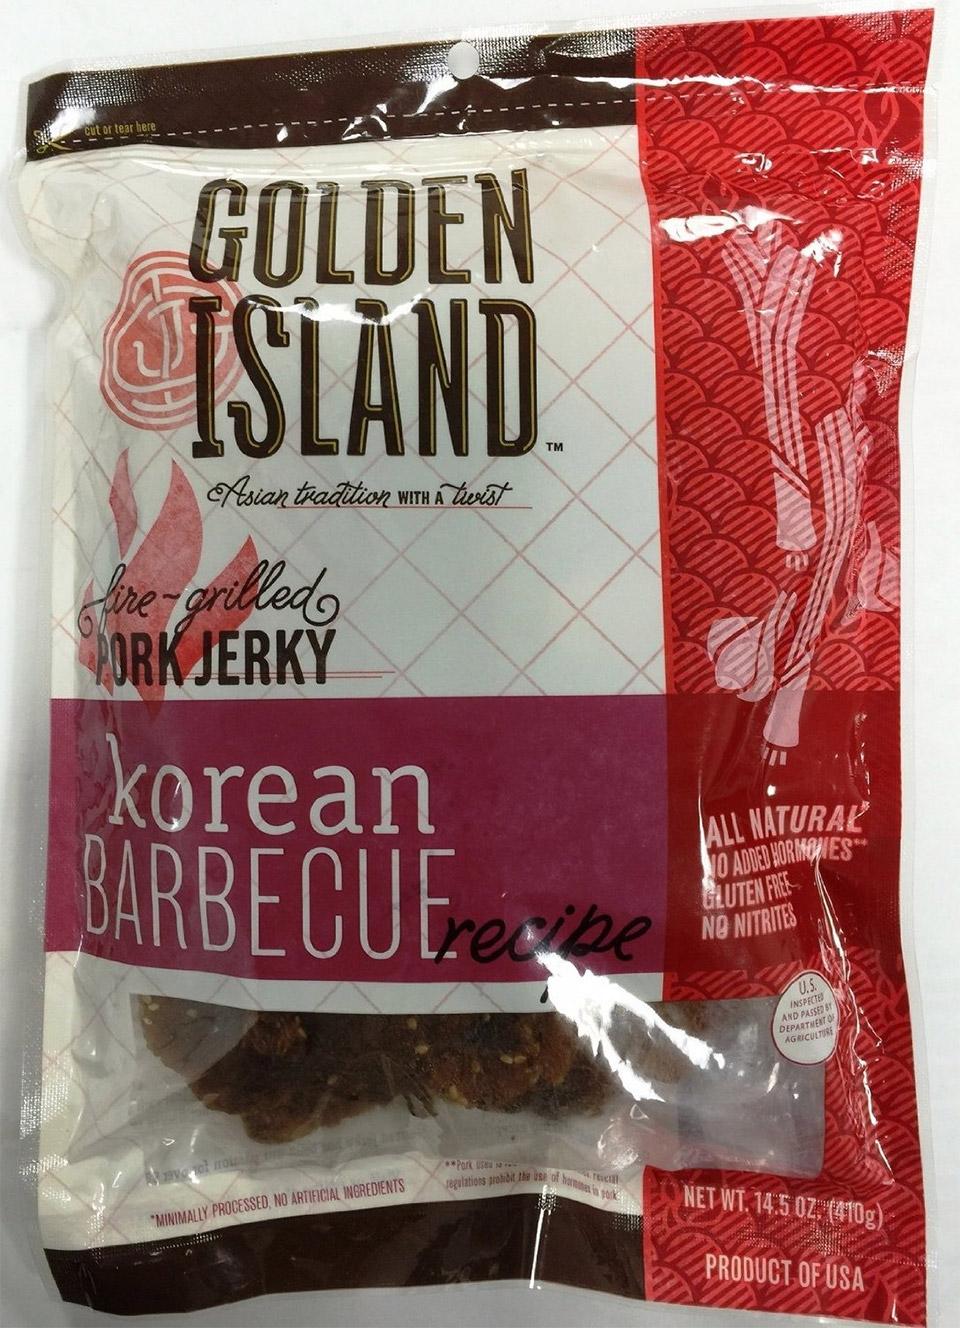 Golden Island Korean BBQ Jerky